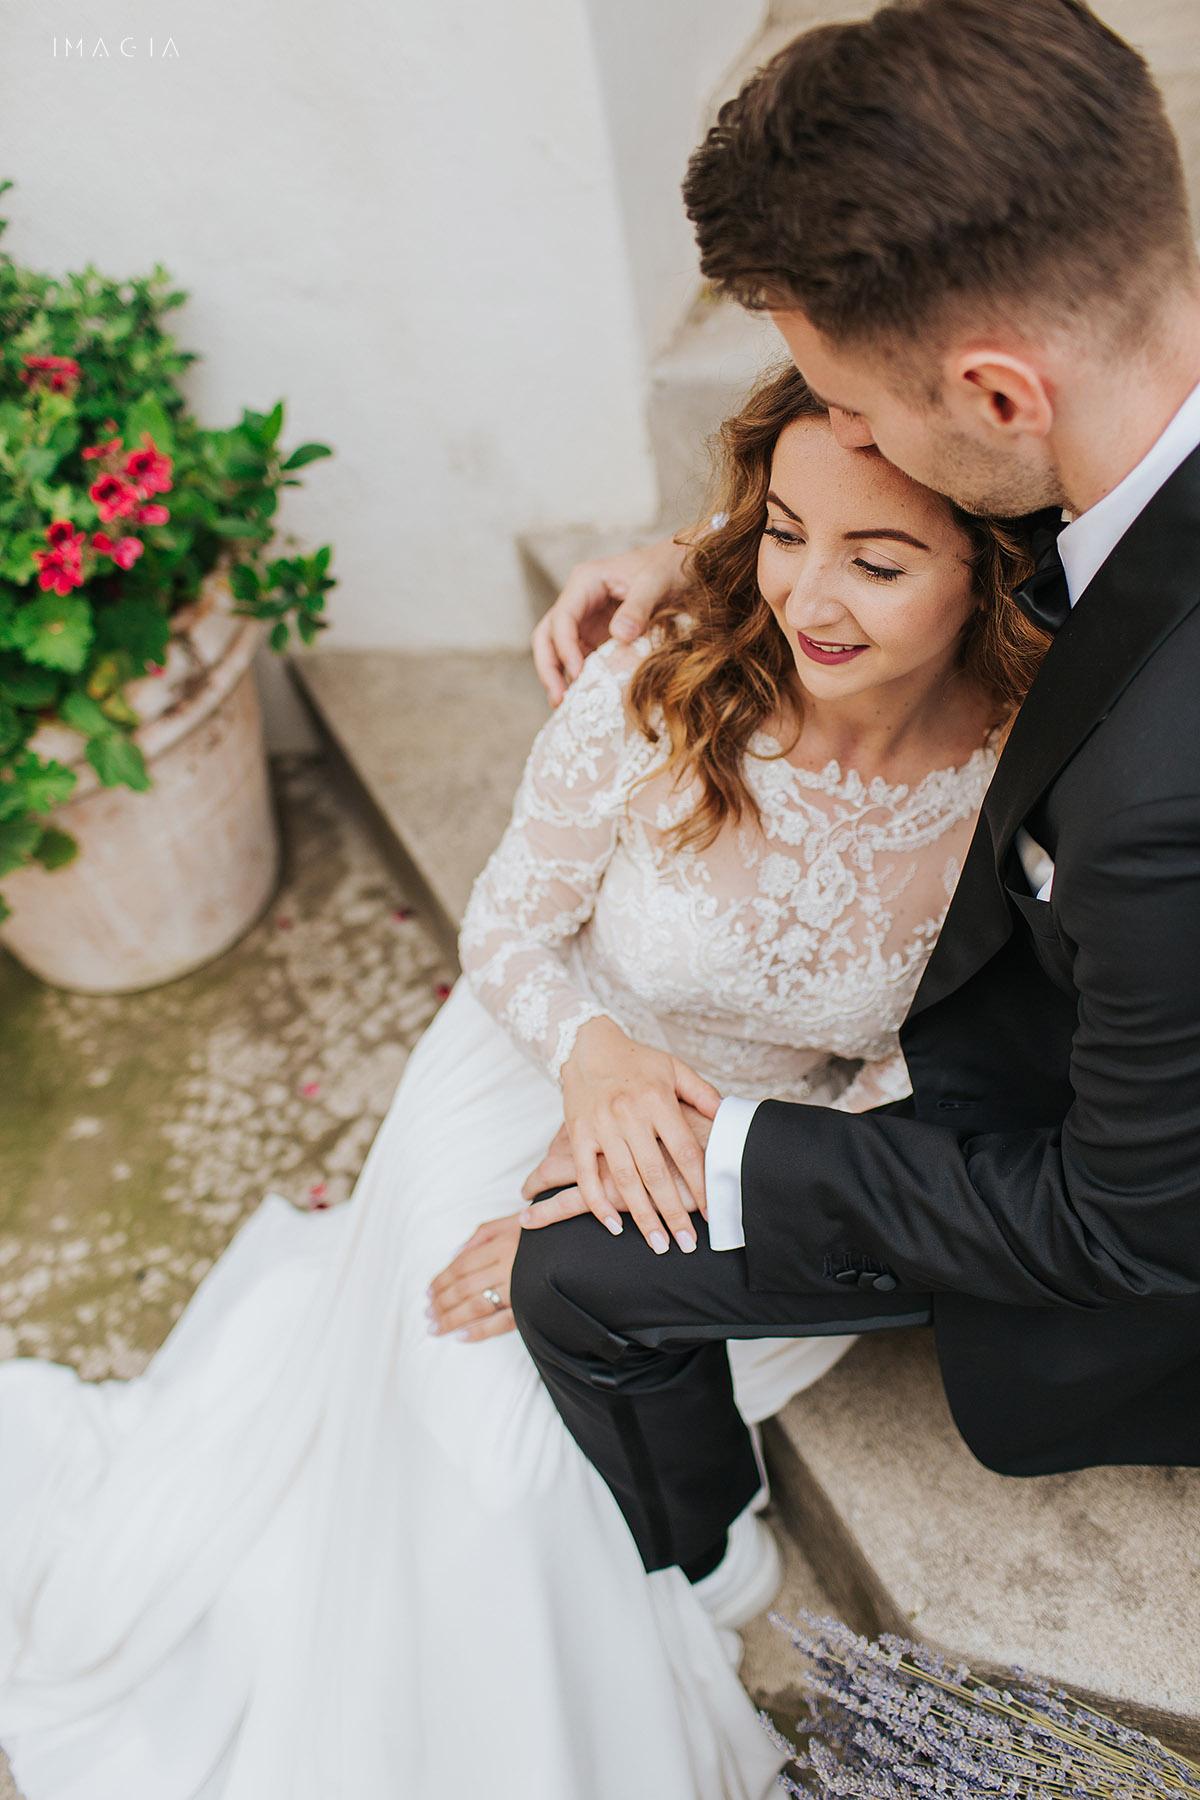 Sedinta foto dupa nunta in Amalfi